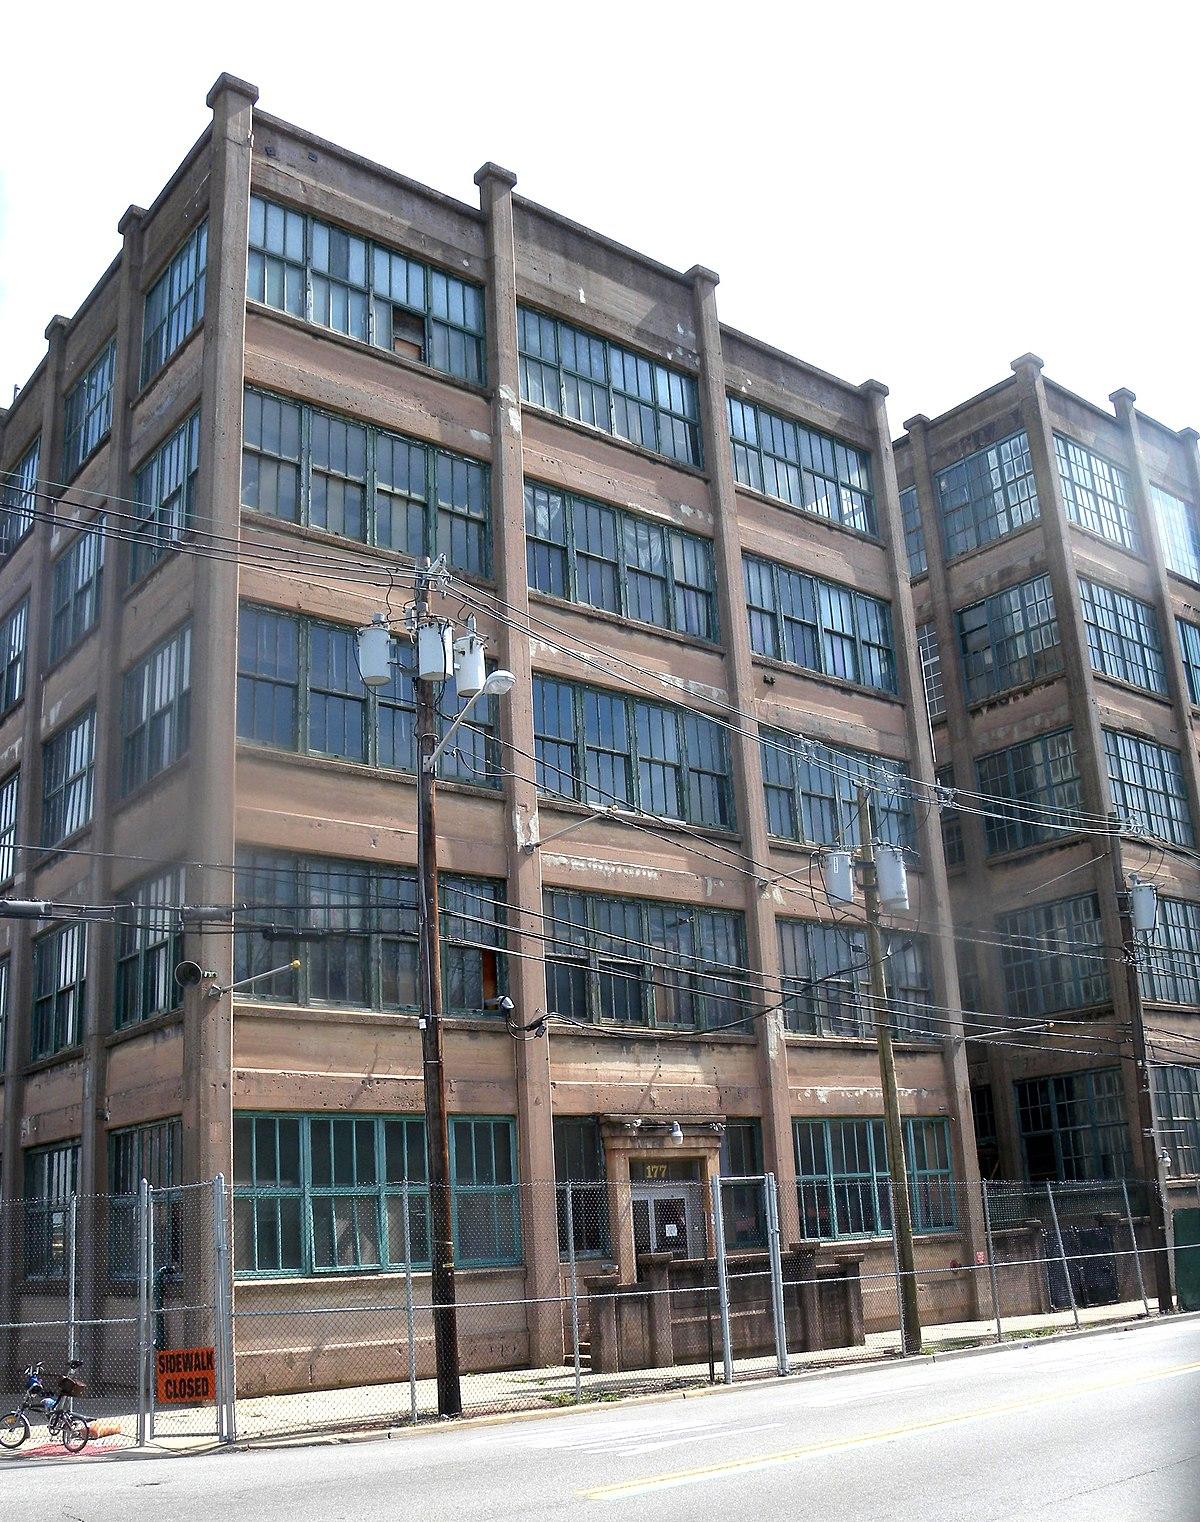 Edison Storage Battery Company Building - Wikipedia